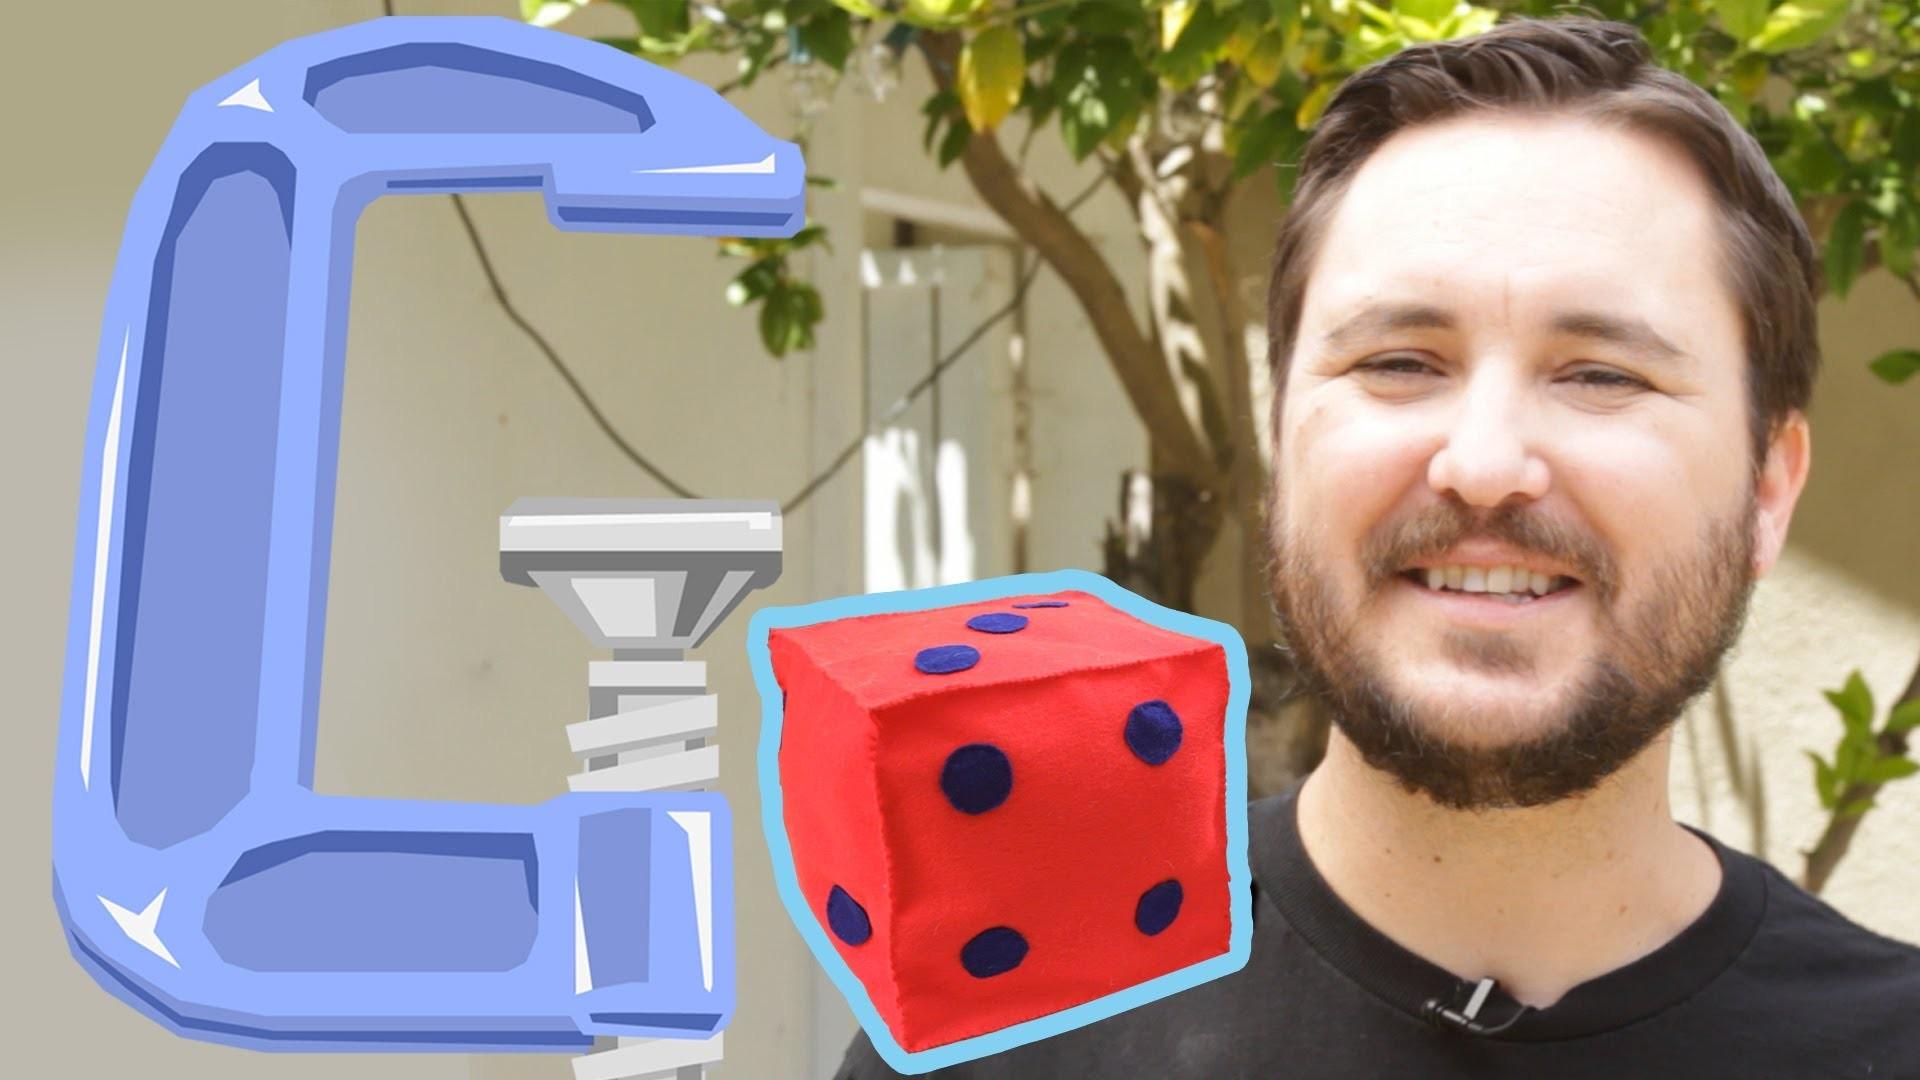 Wil Wheaton makes Dice Pillows - Geek DIY - Ep3